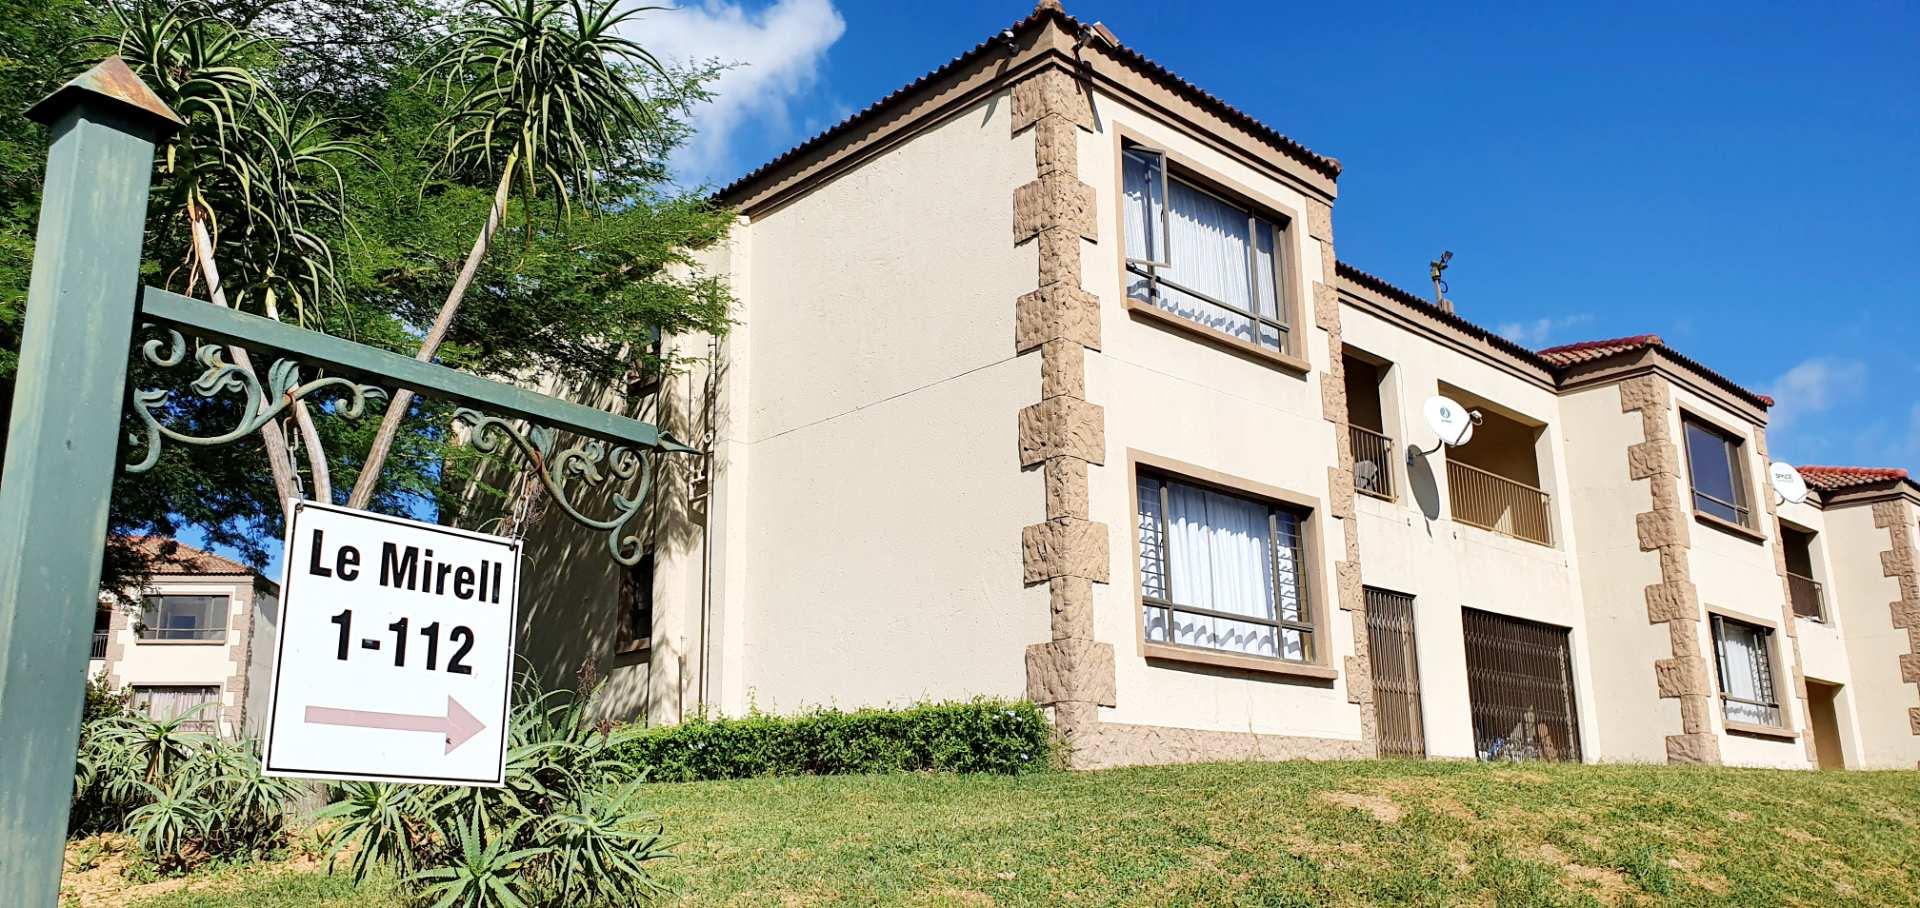 Apartment Rental Monthly in Stonehenge